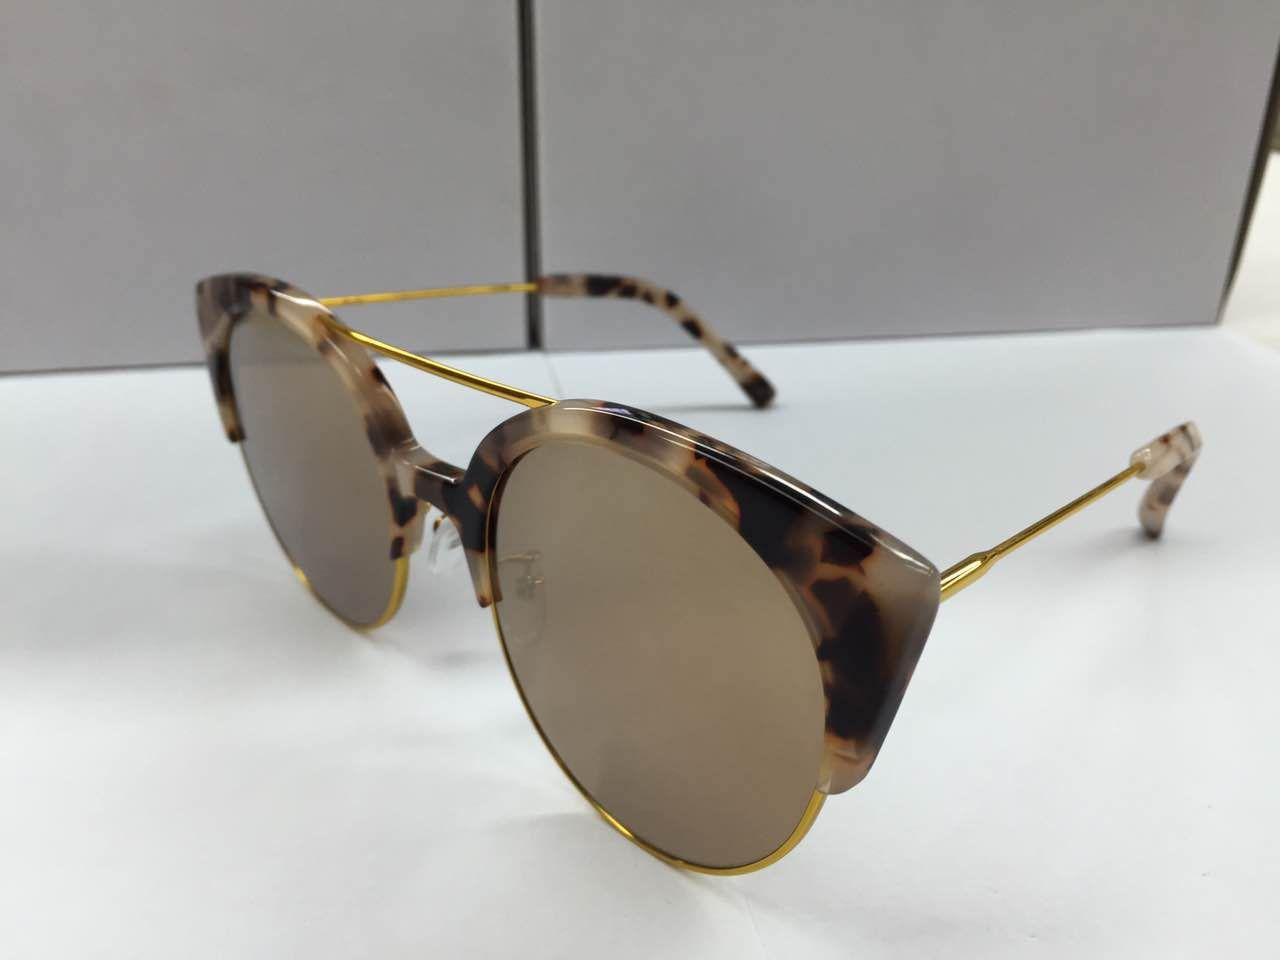 93feb24cd70 Hot Sale Promotion Custom Top Fashion Handmade Sunglasses Manufacturers